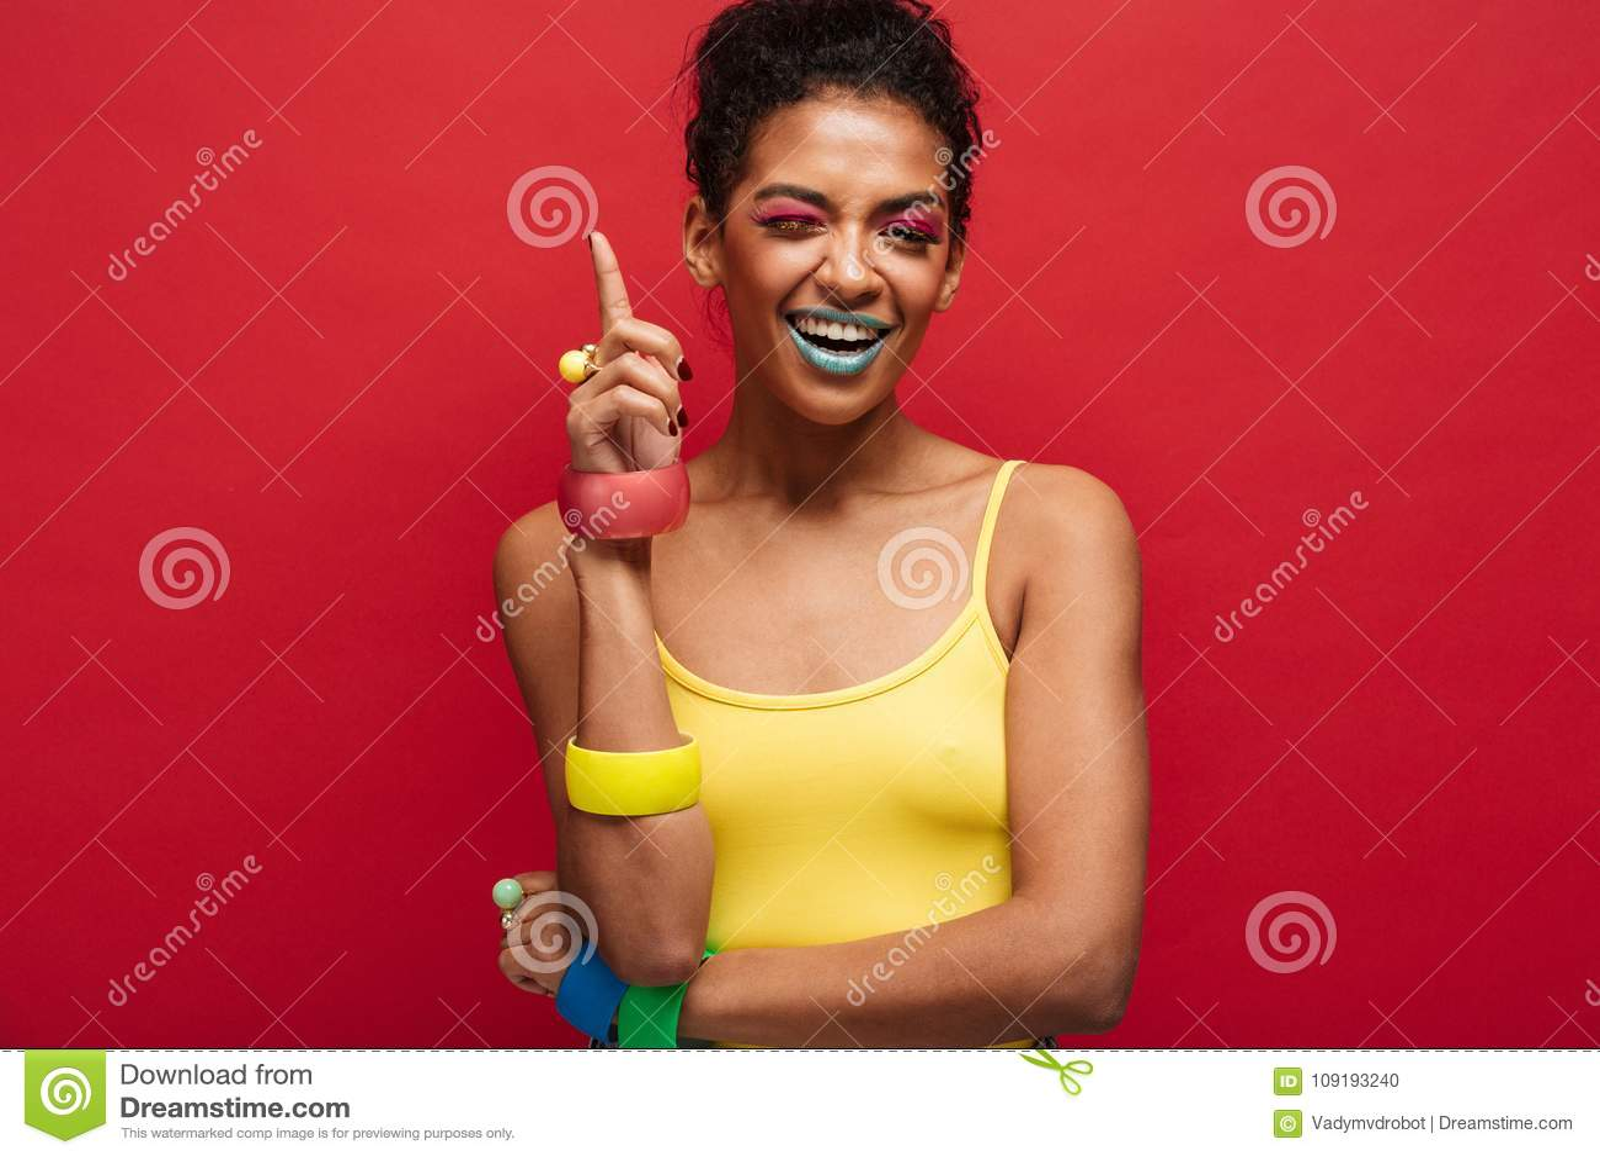 Forme la imagen del modelo femenino afroamericano alegre en amarillo